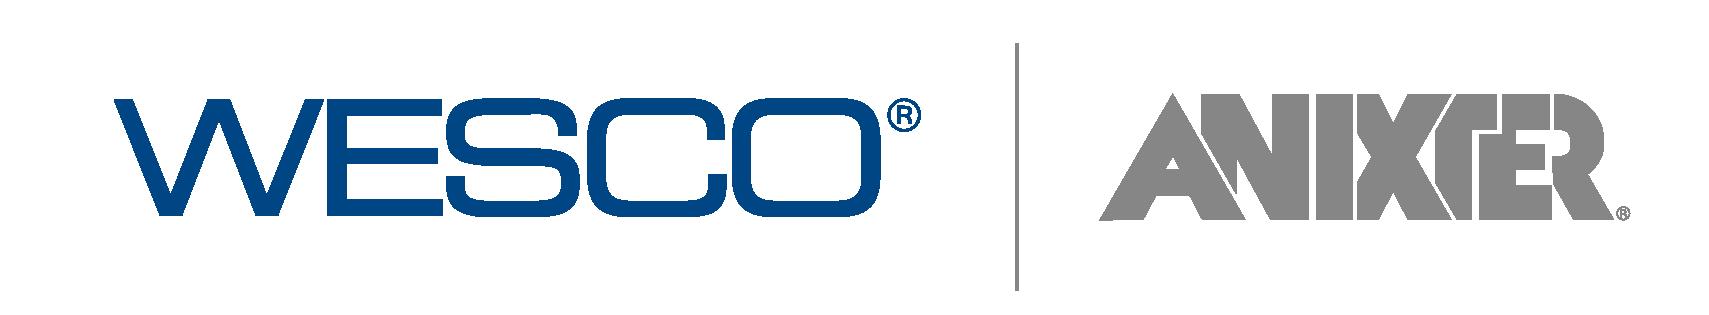 Anixter-Wesco-logo-01